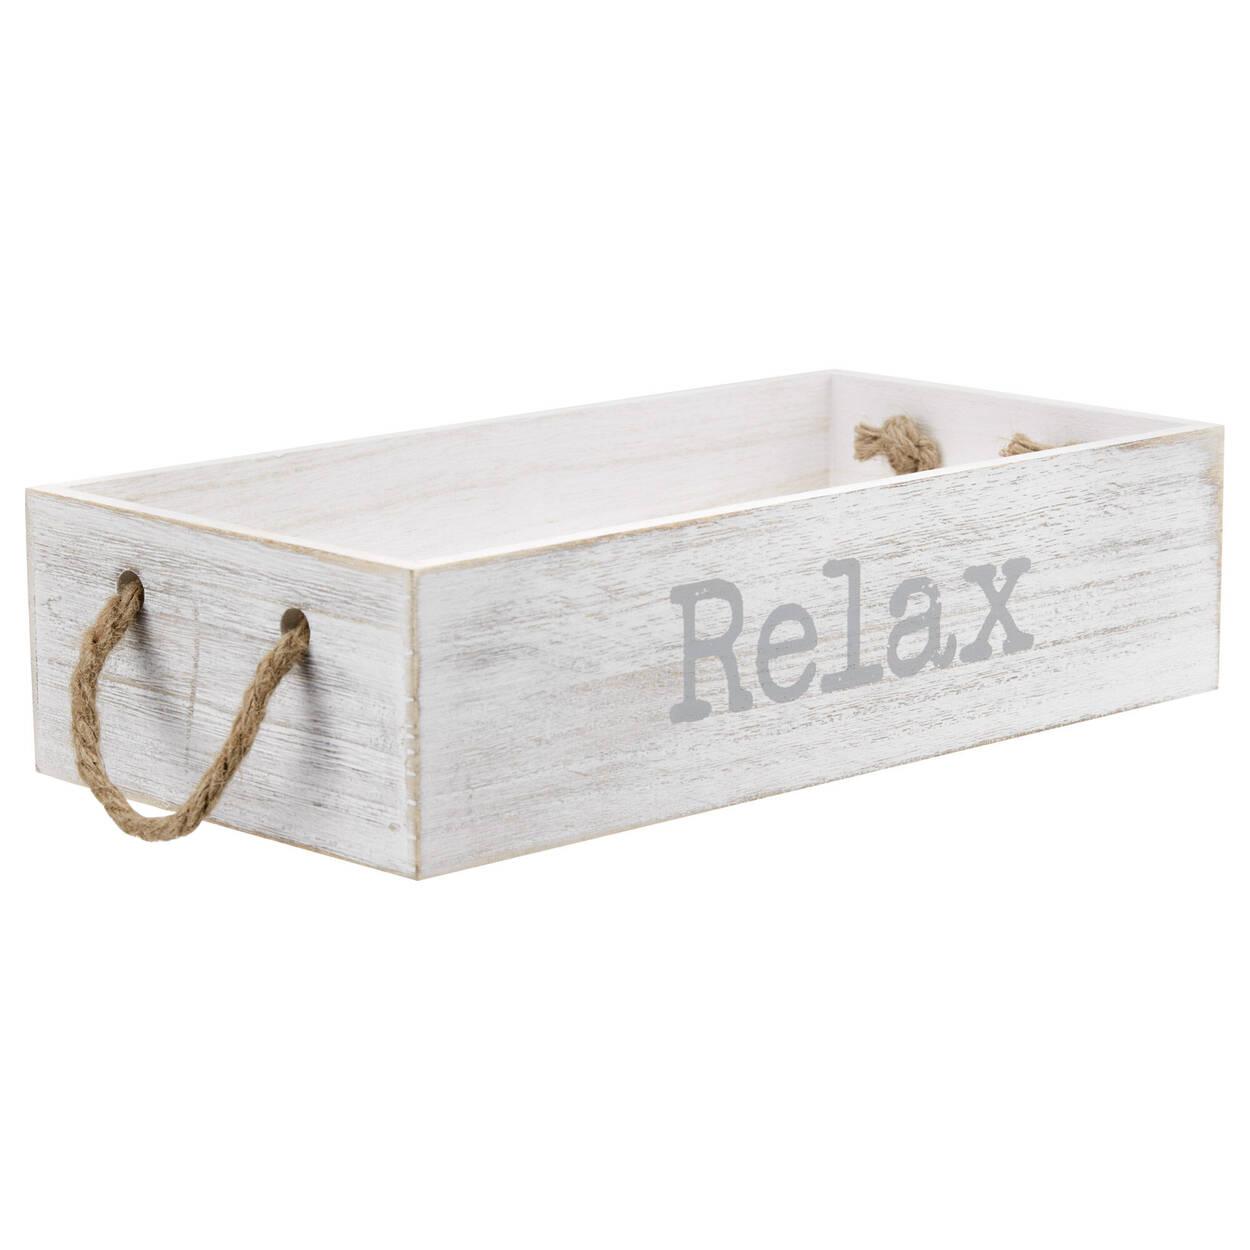 Plateau en bois Relax